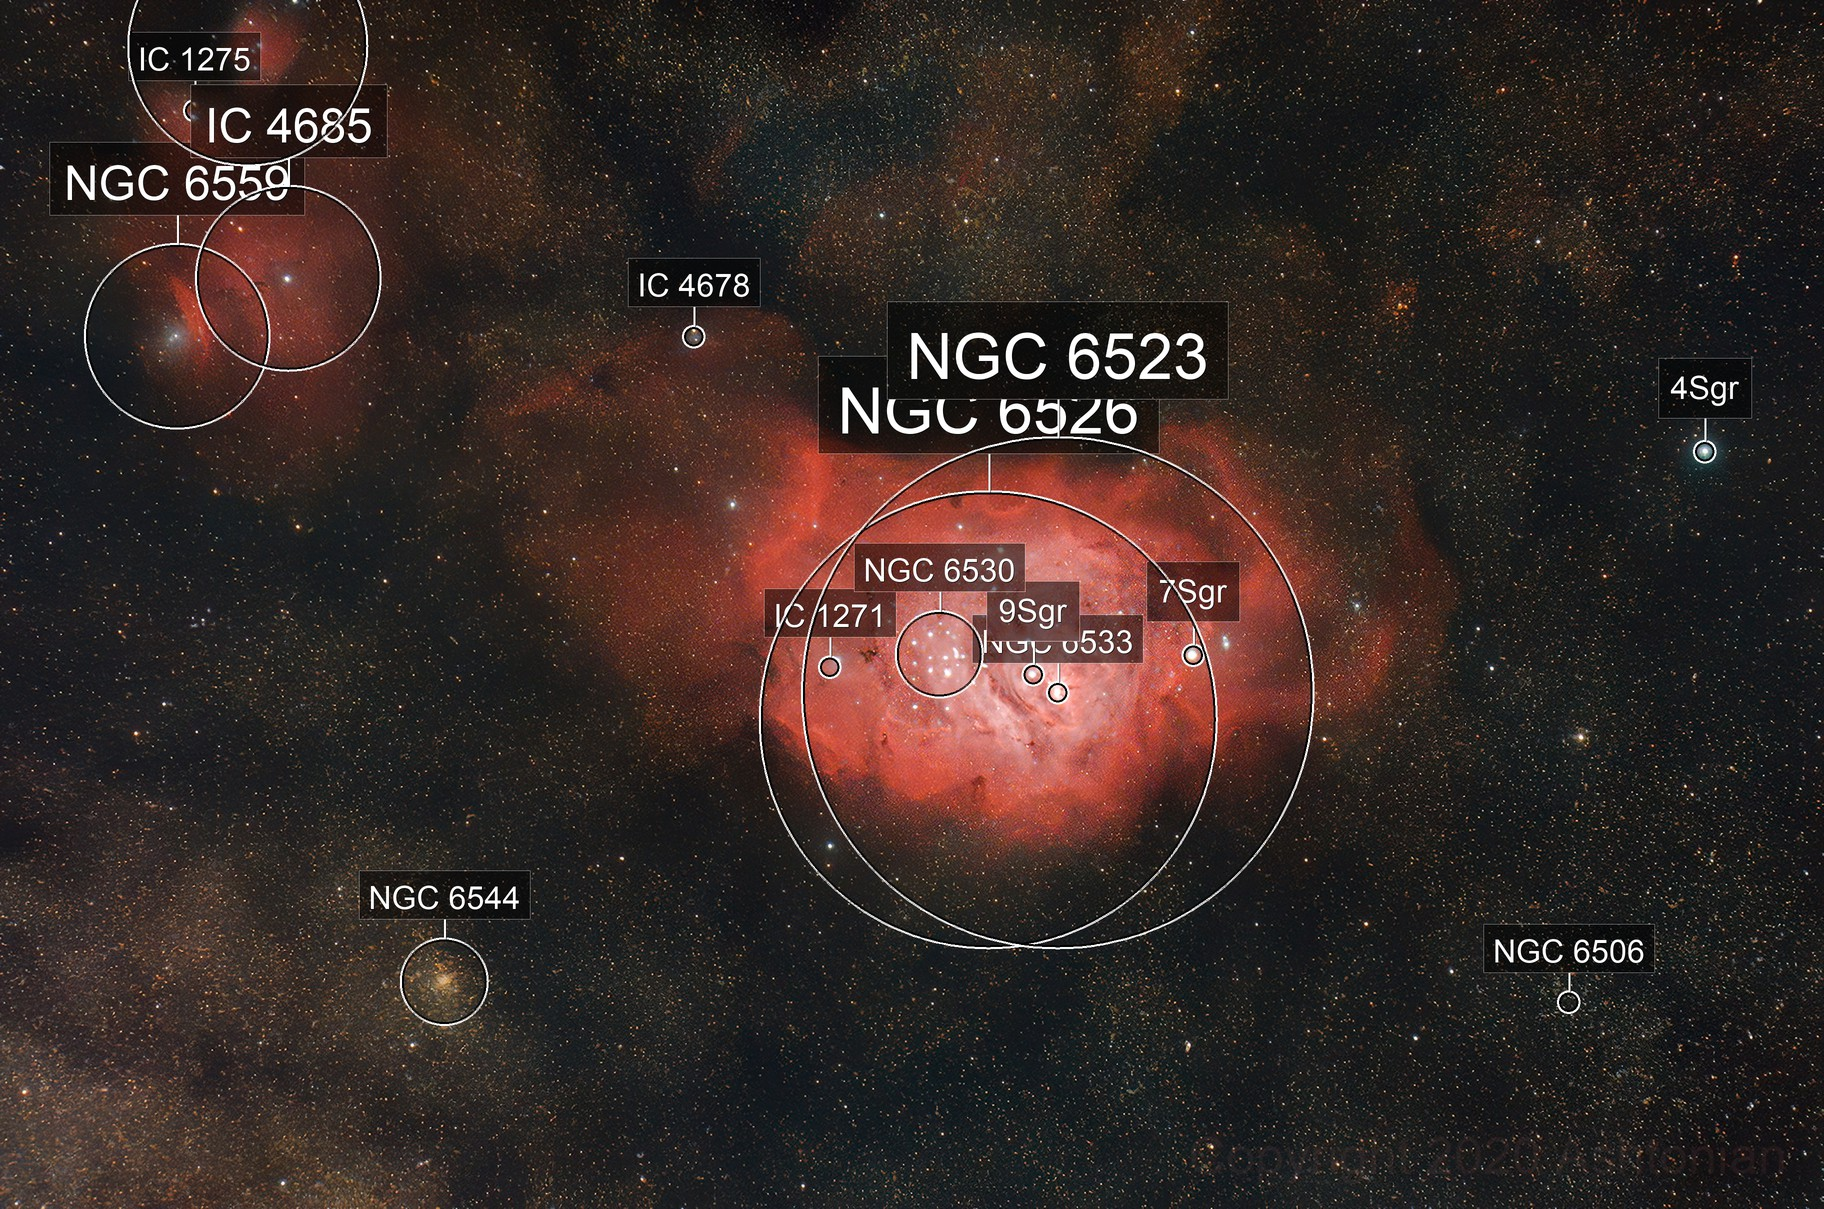 Messier 8: The Lagoon nebula